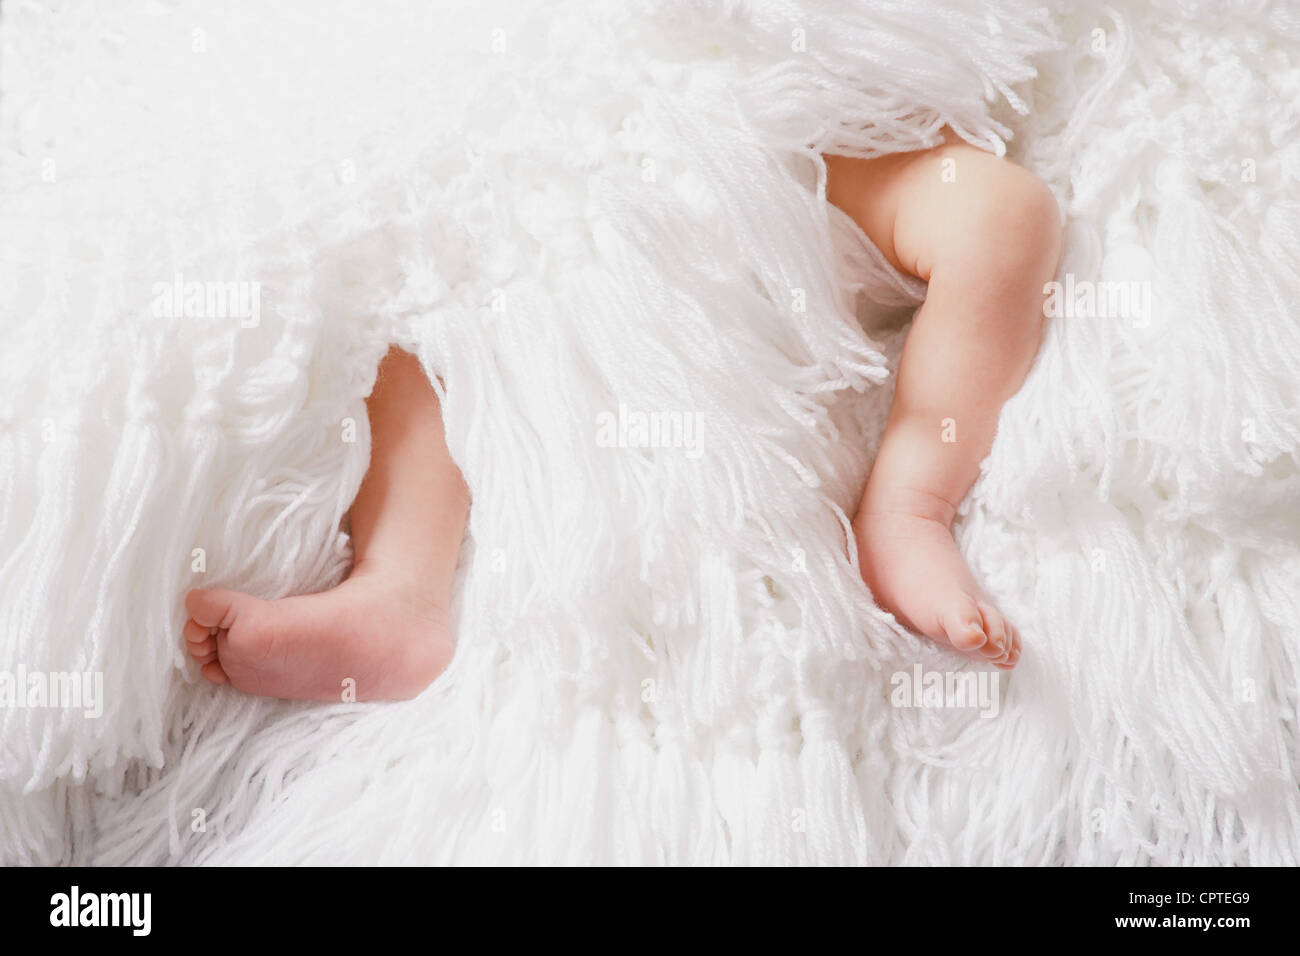 Baby boy's legs on white blanket - Stock Image